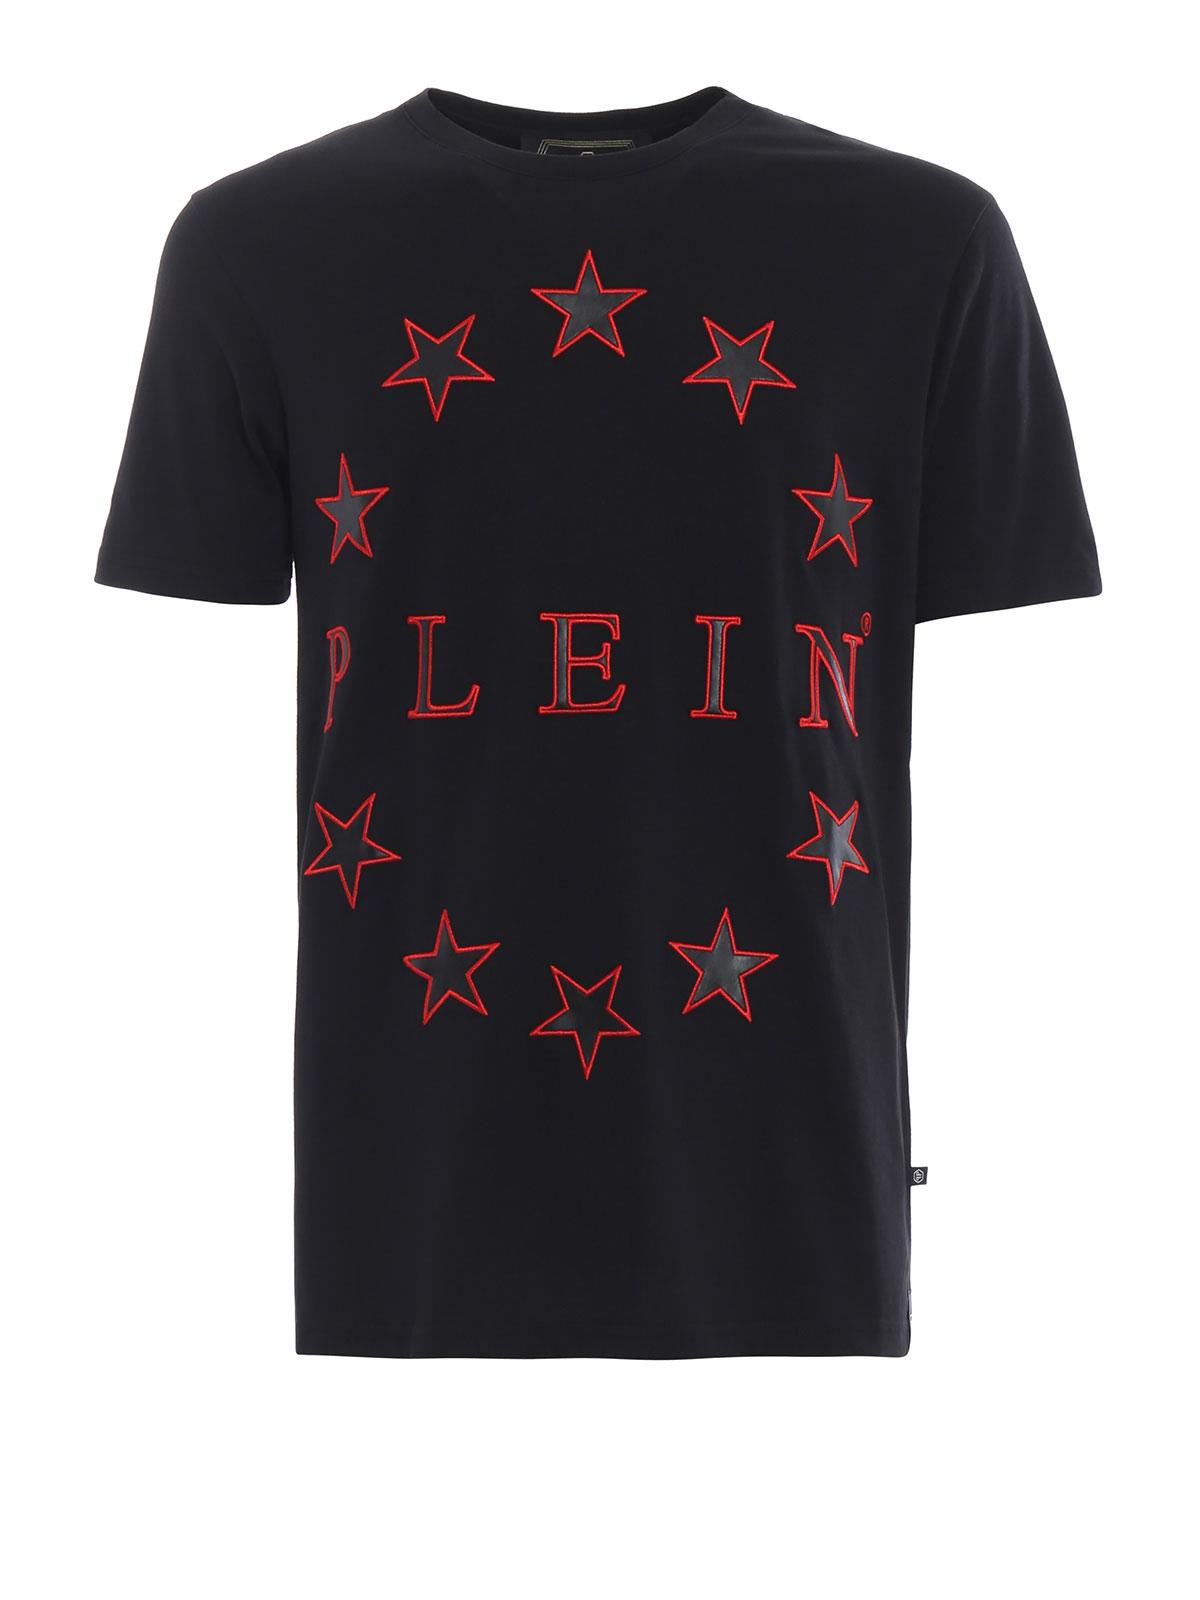 Philipp Plein - Plein multi star pattern black cotton T